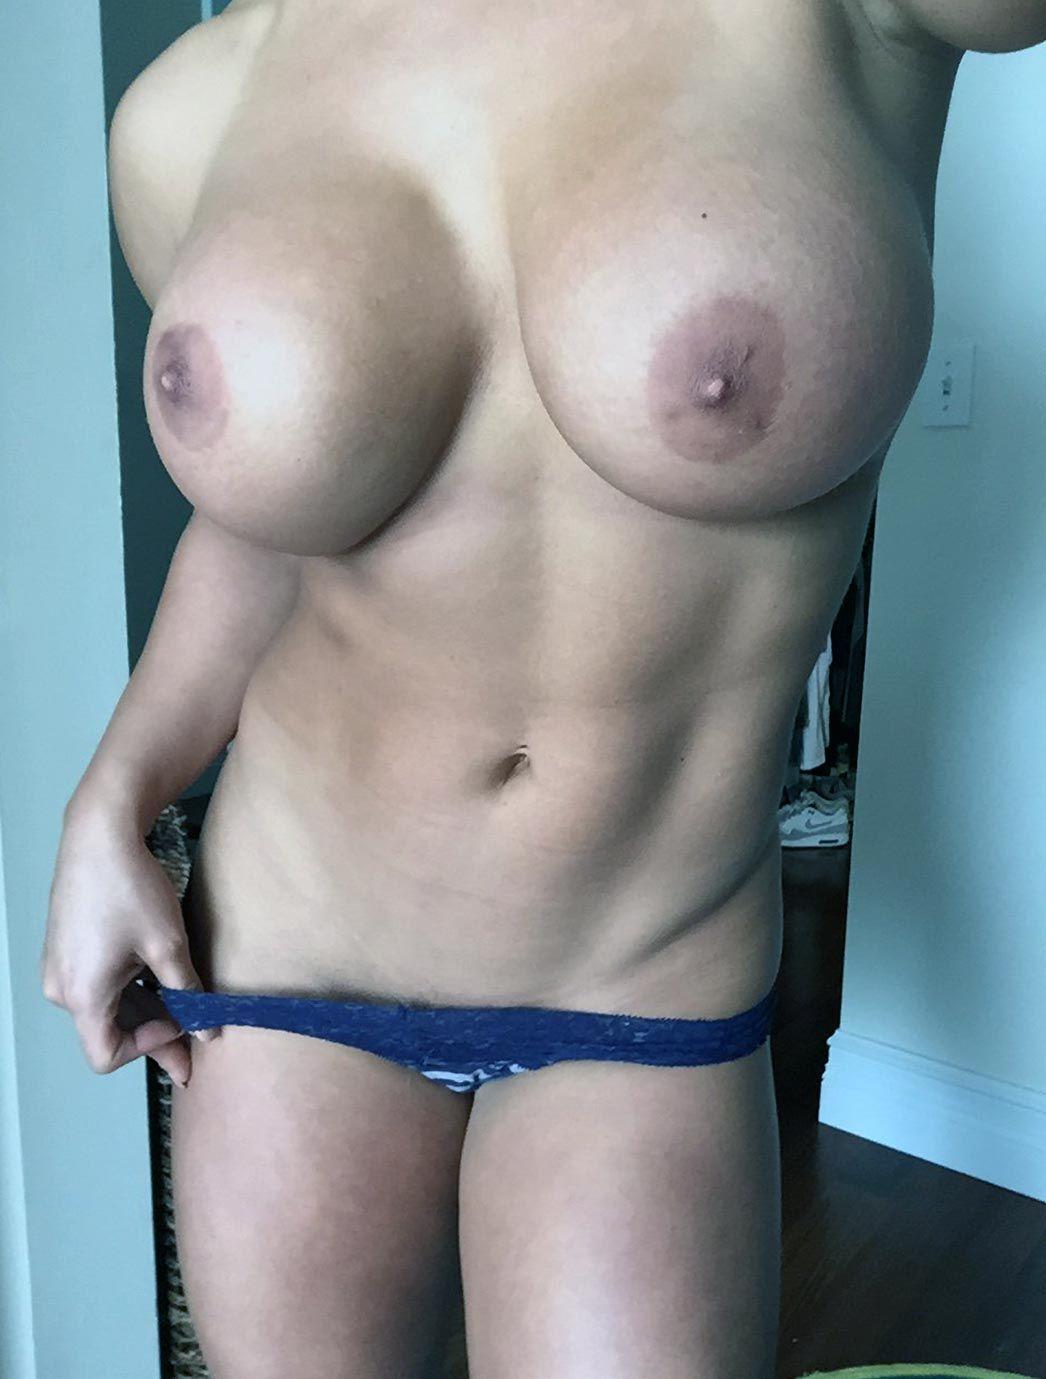 Celeste Bonin Nude Leaked The Fappening & Sexy 0204